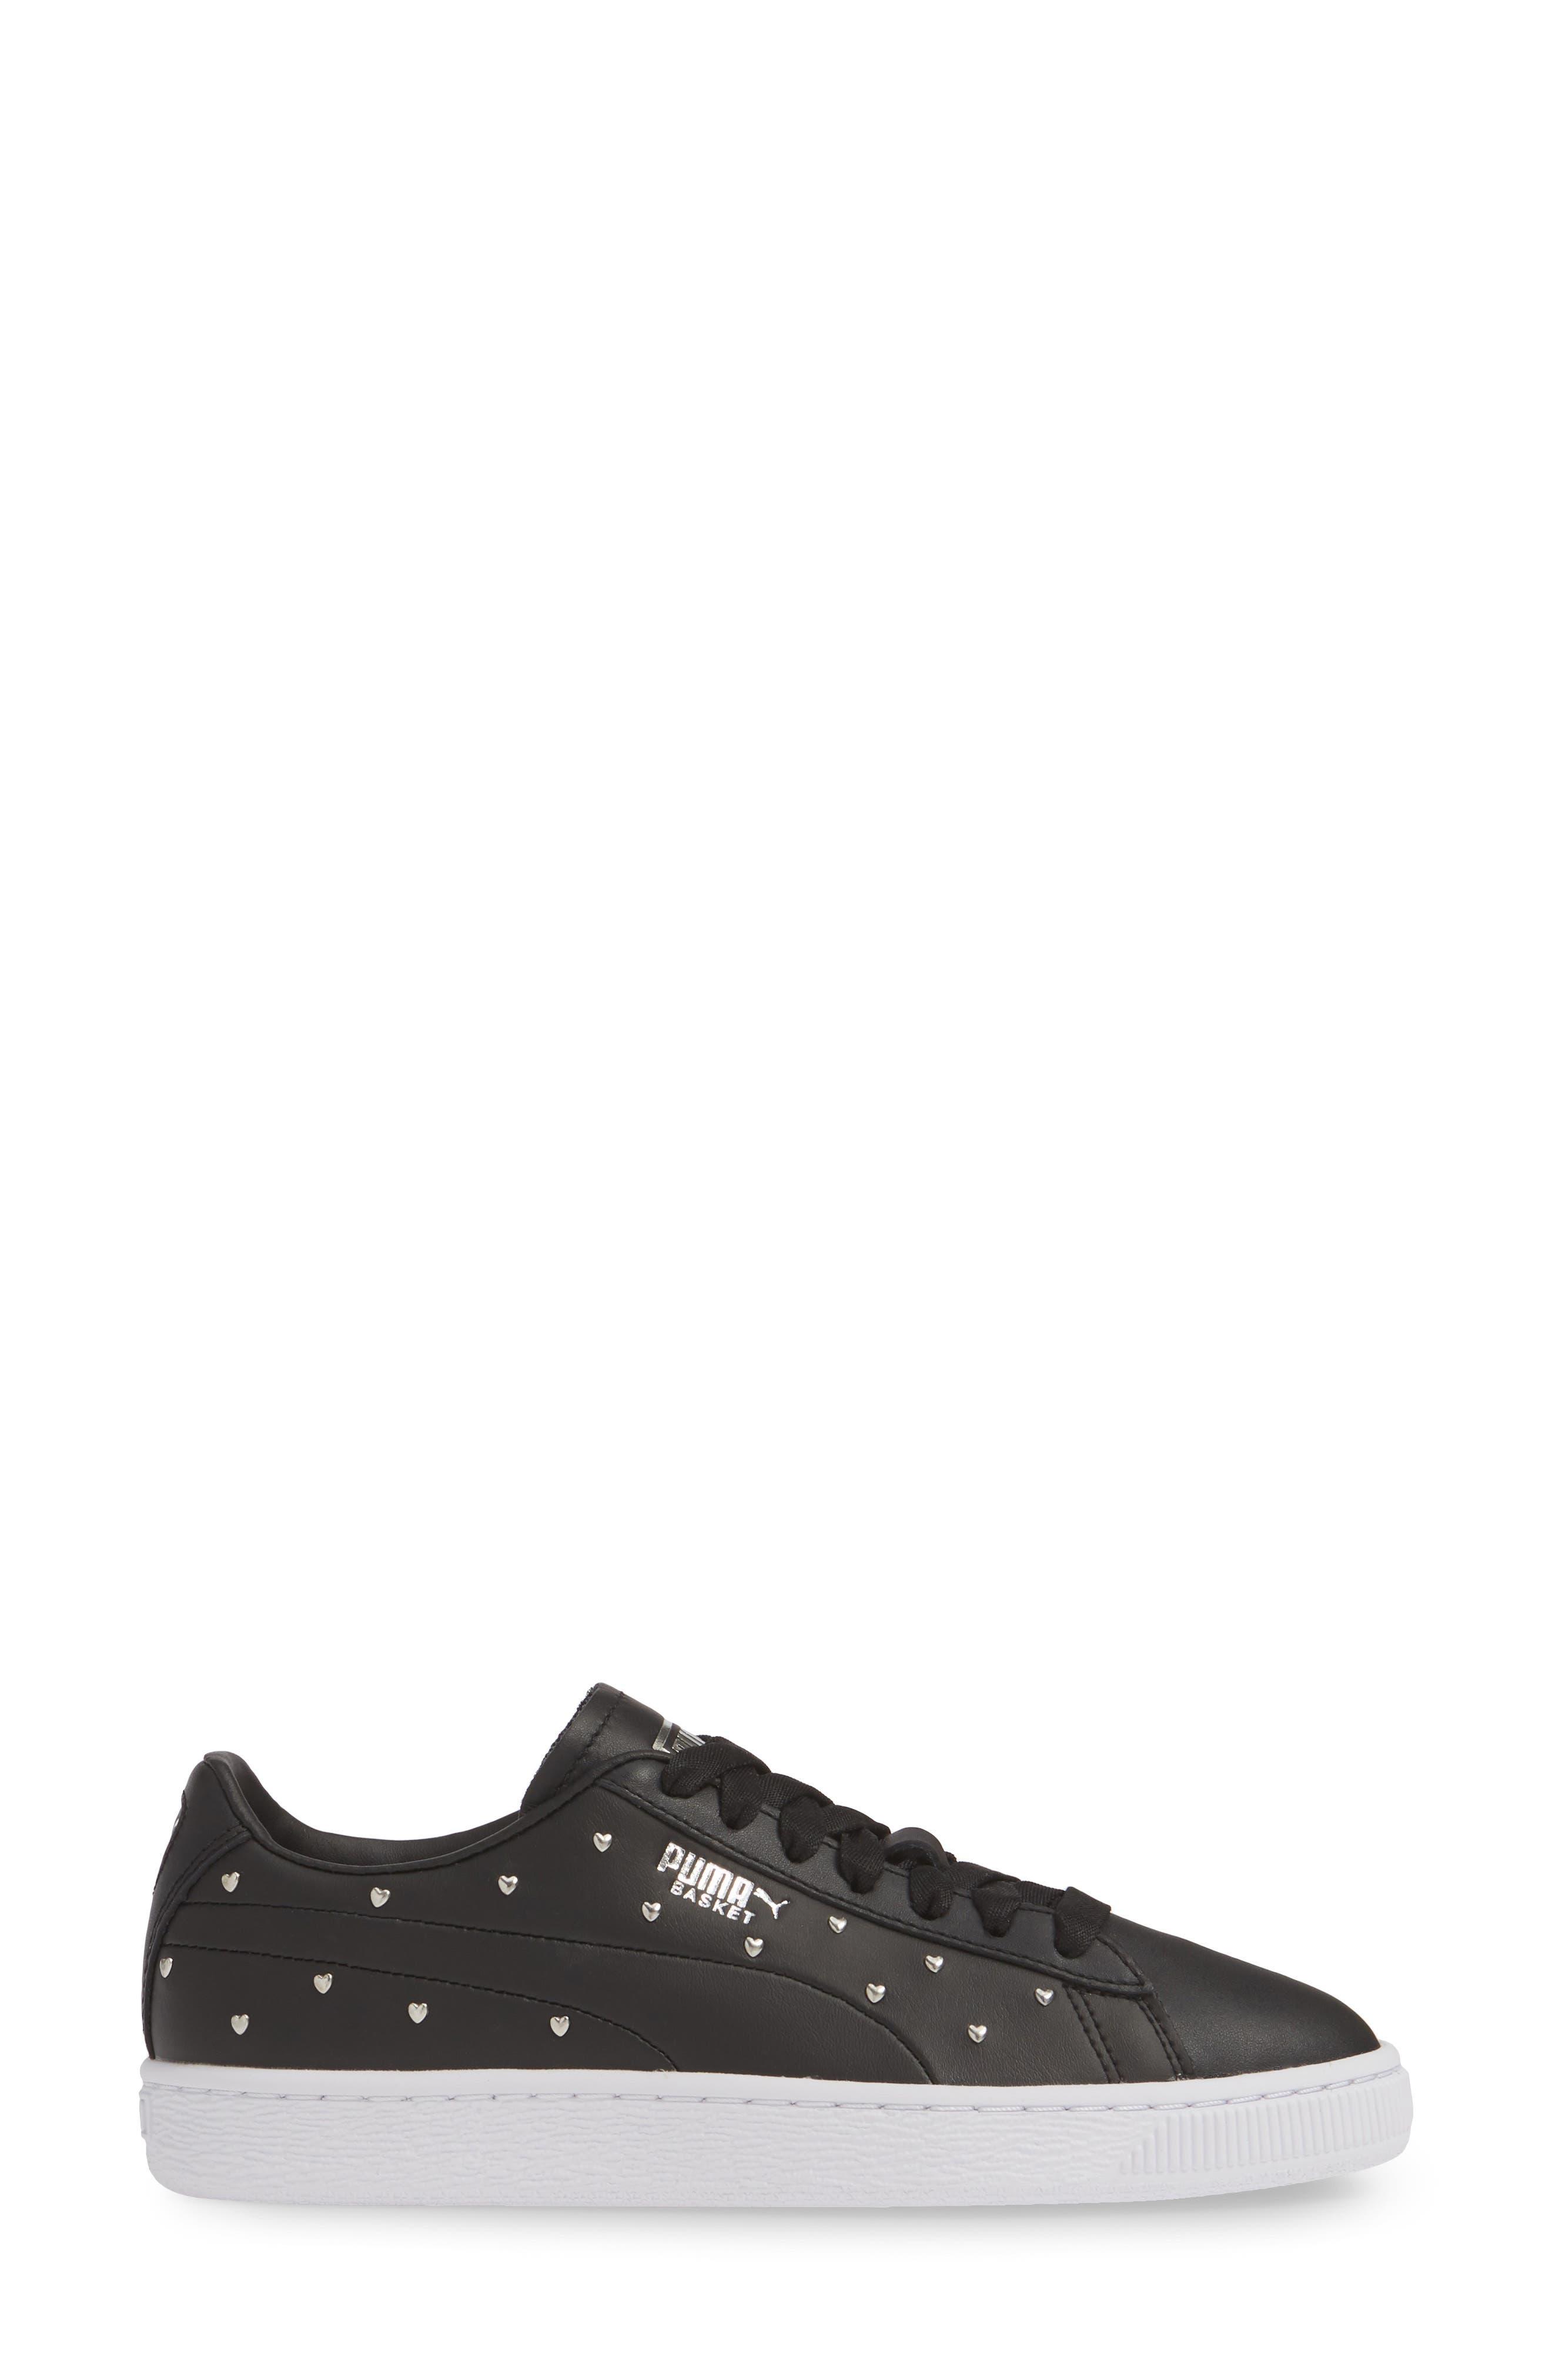 PUMA, Basket Studs Sneaker, Alternate thumbnail 3, color, BLACK/ SILVER